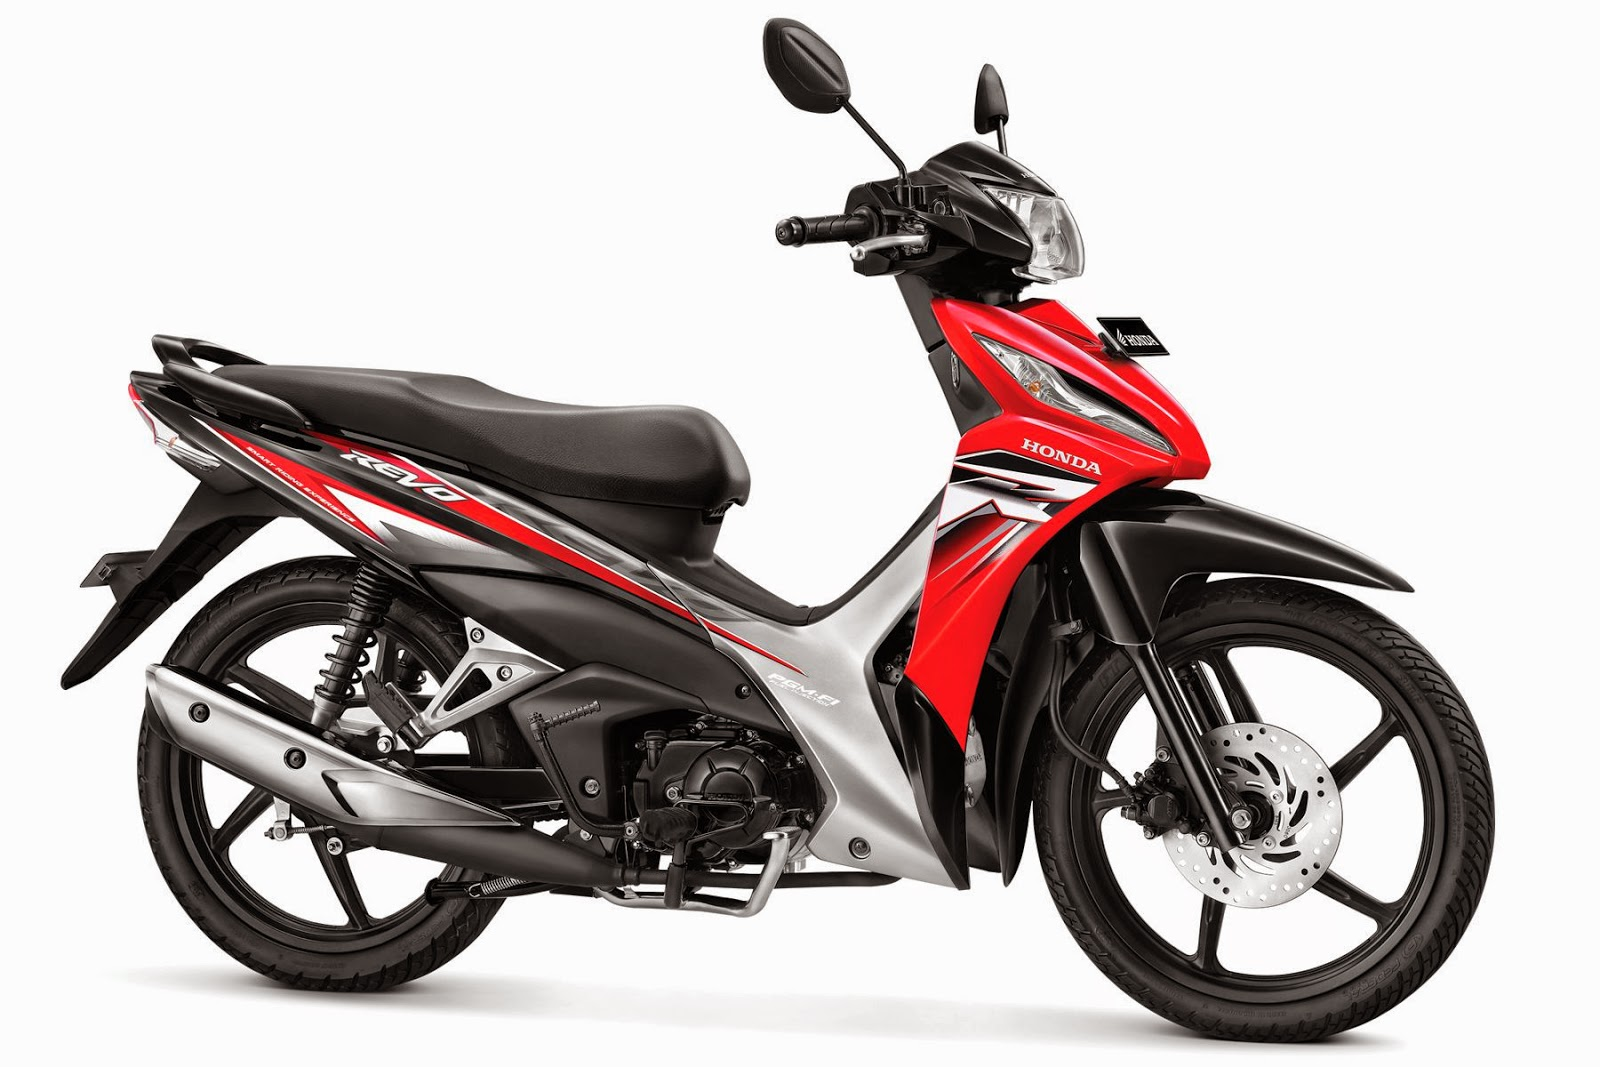 Spesifikasi Honda New Revo FI